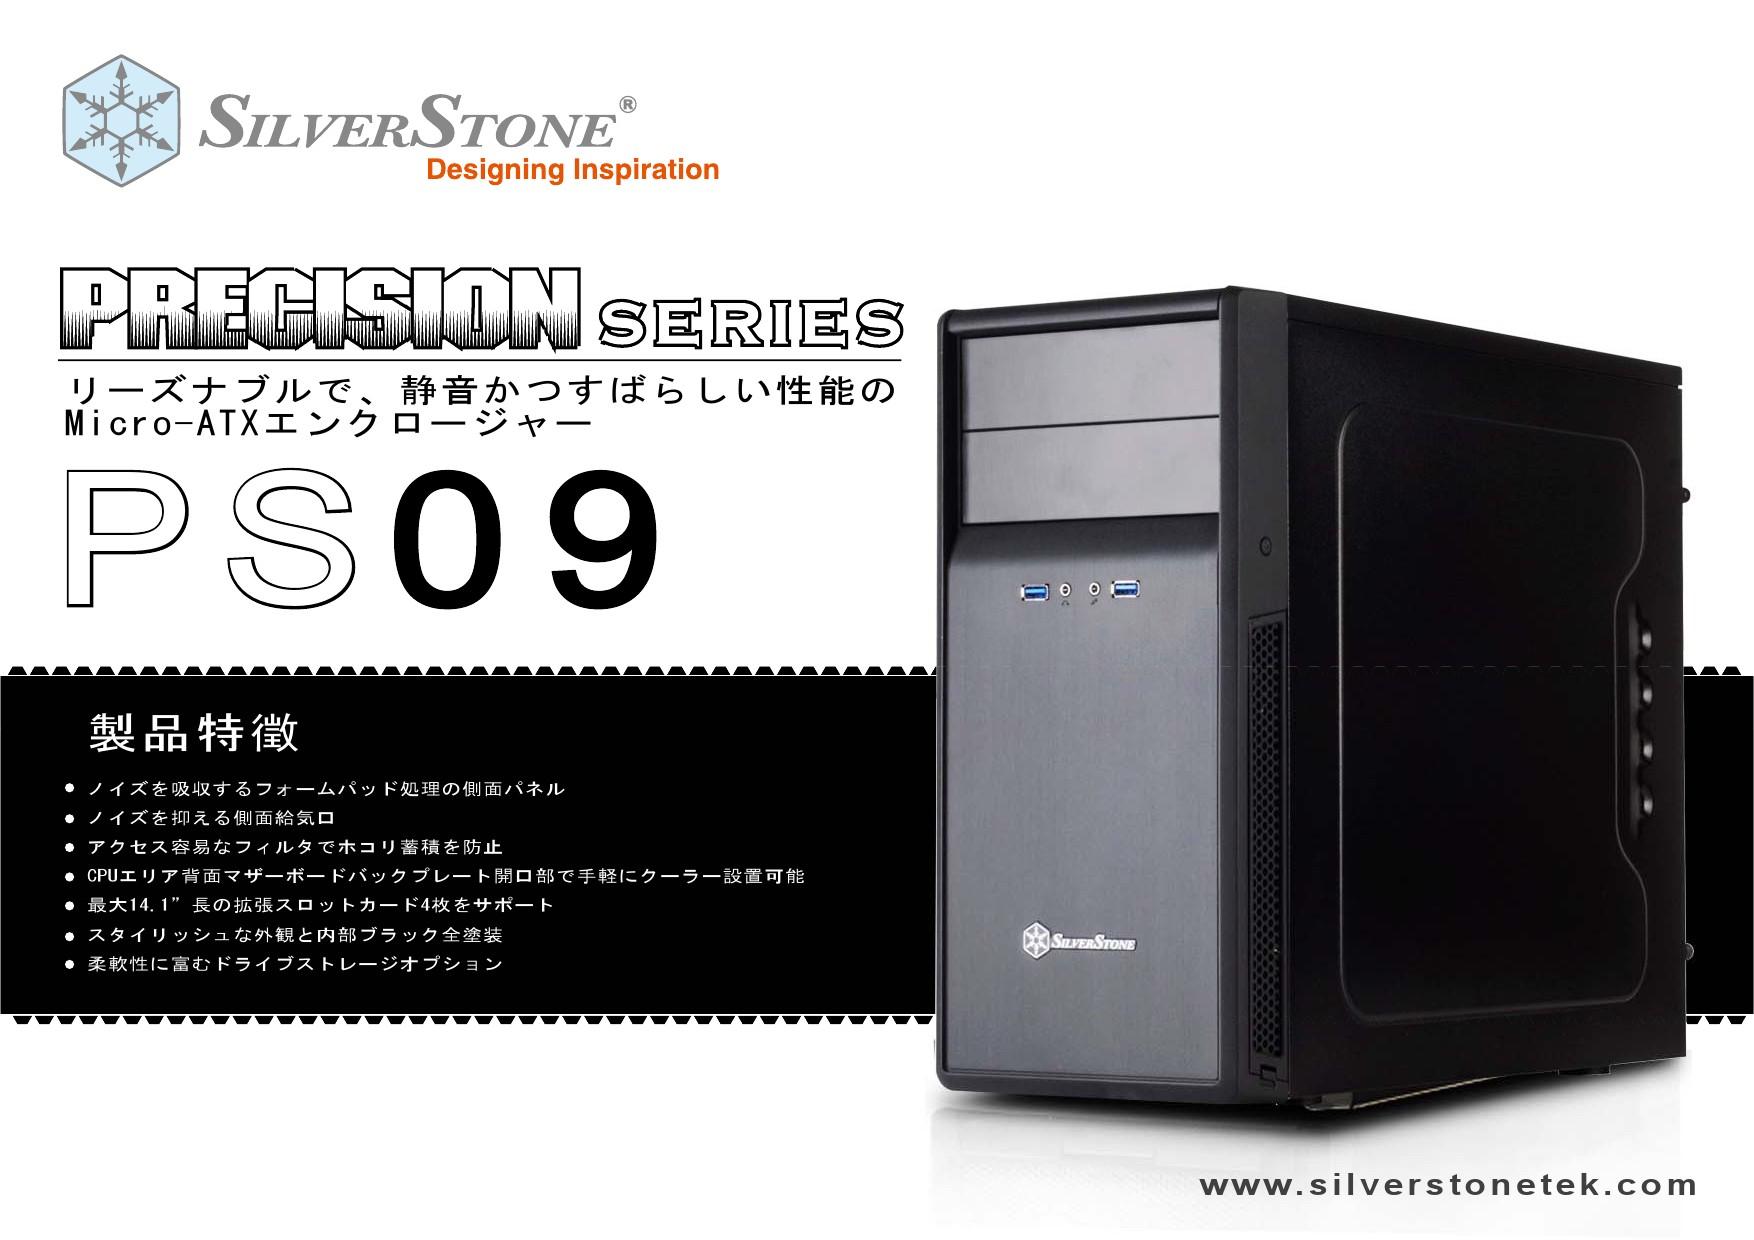 JP-PS09-EDM-1.jpg